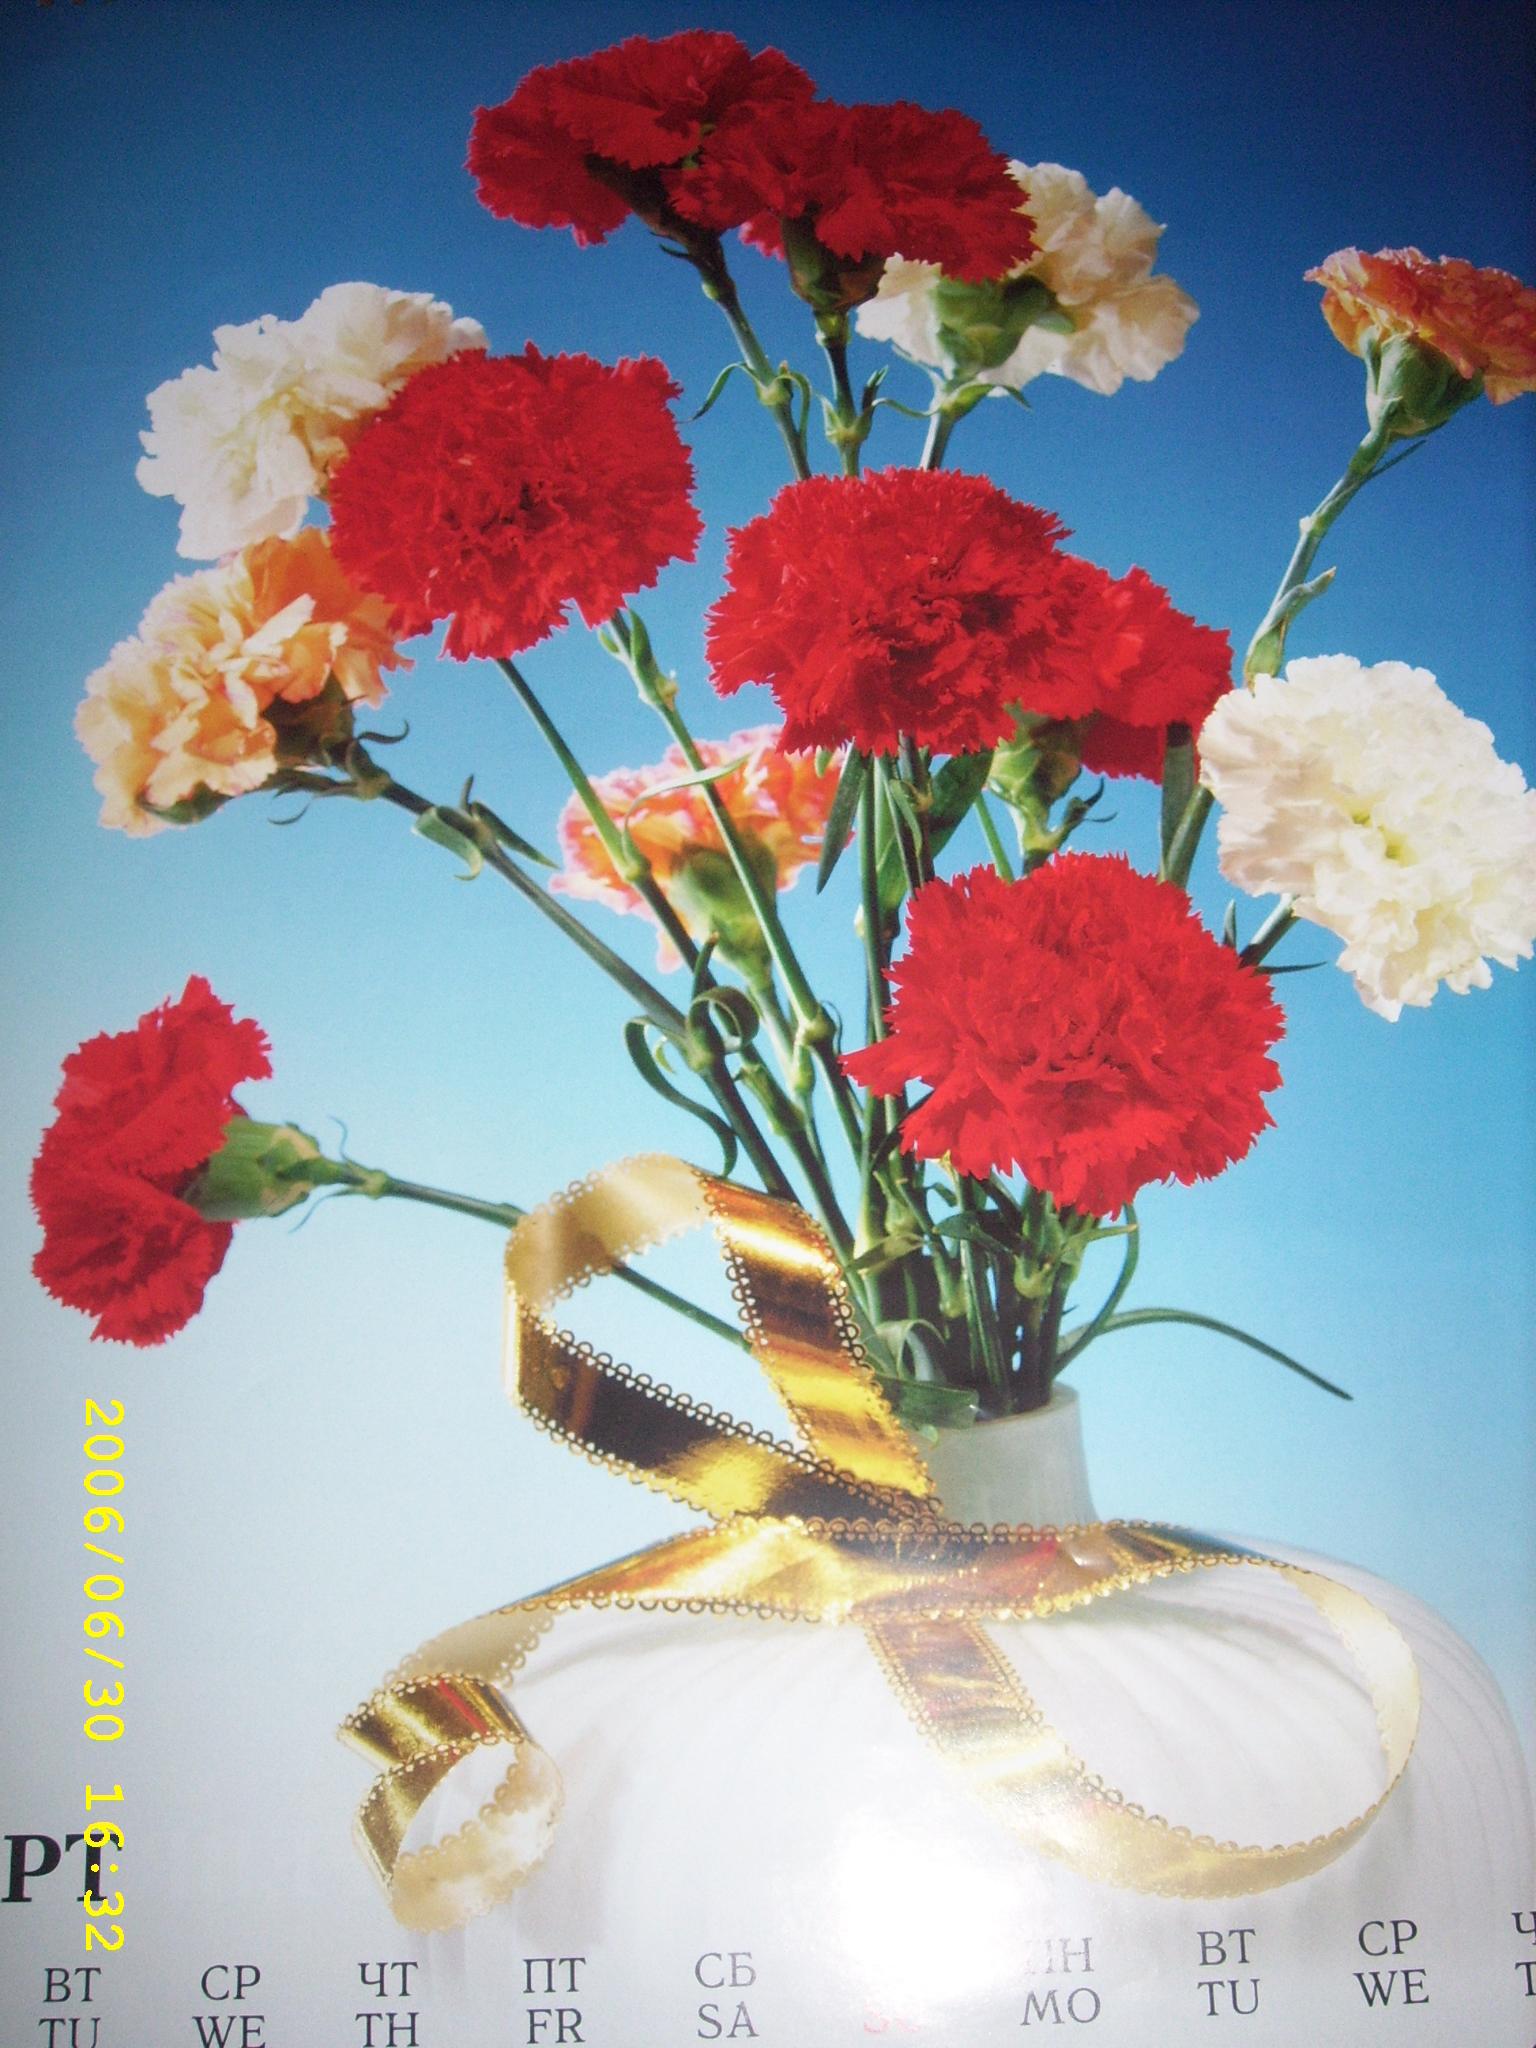 Card flowers 1536x2048 wallpaper 1536x2048